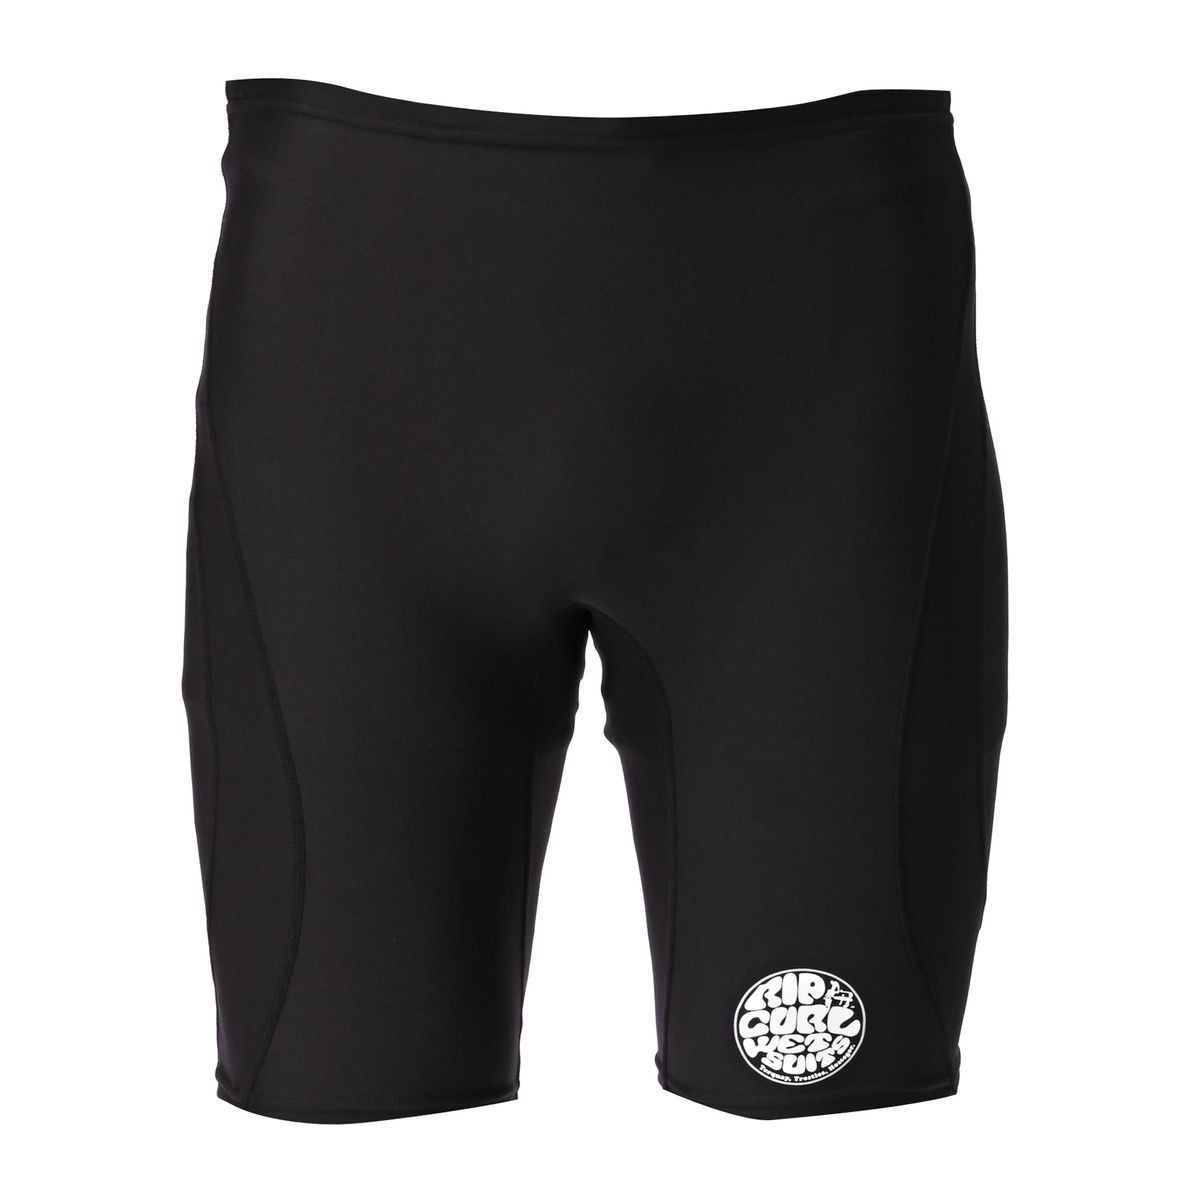 Rip Curl Flashbomb Polypro Shorts - Black